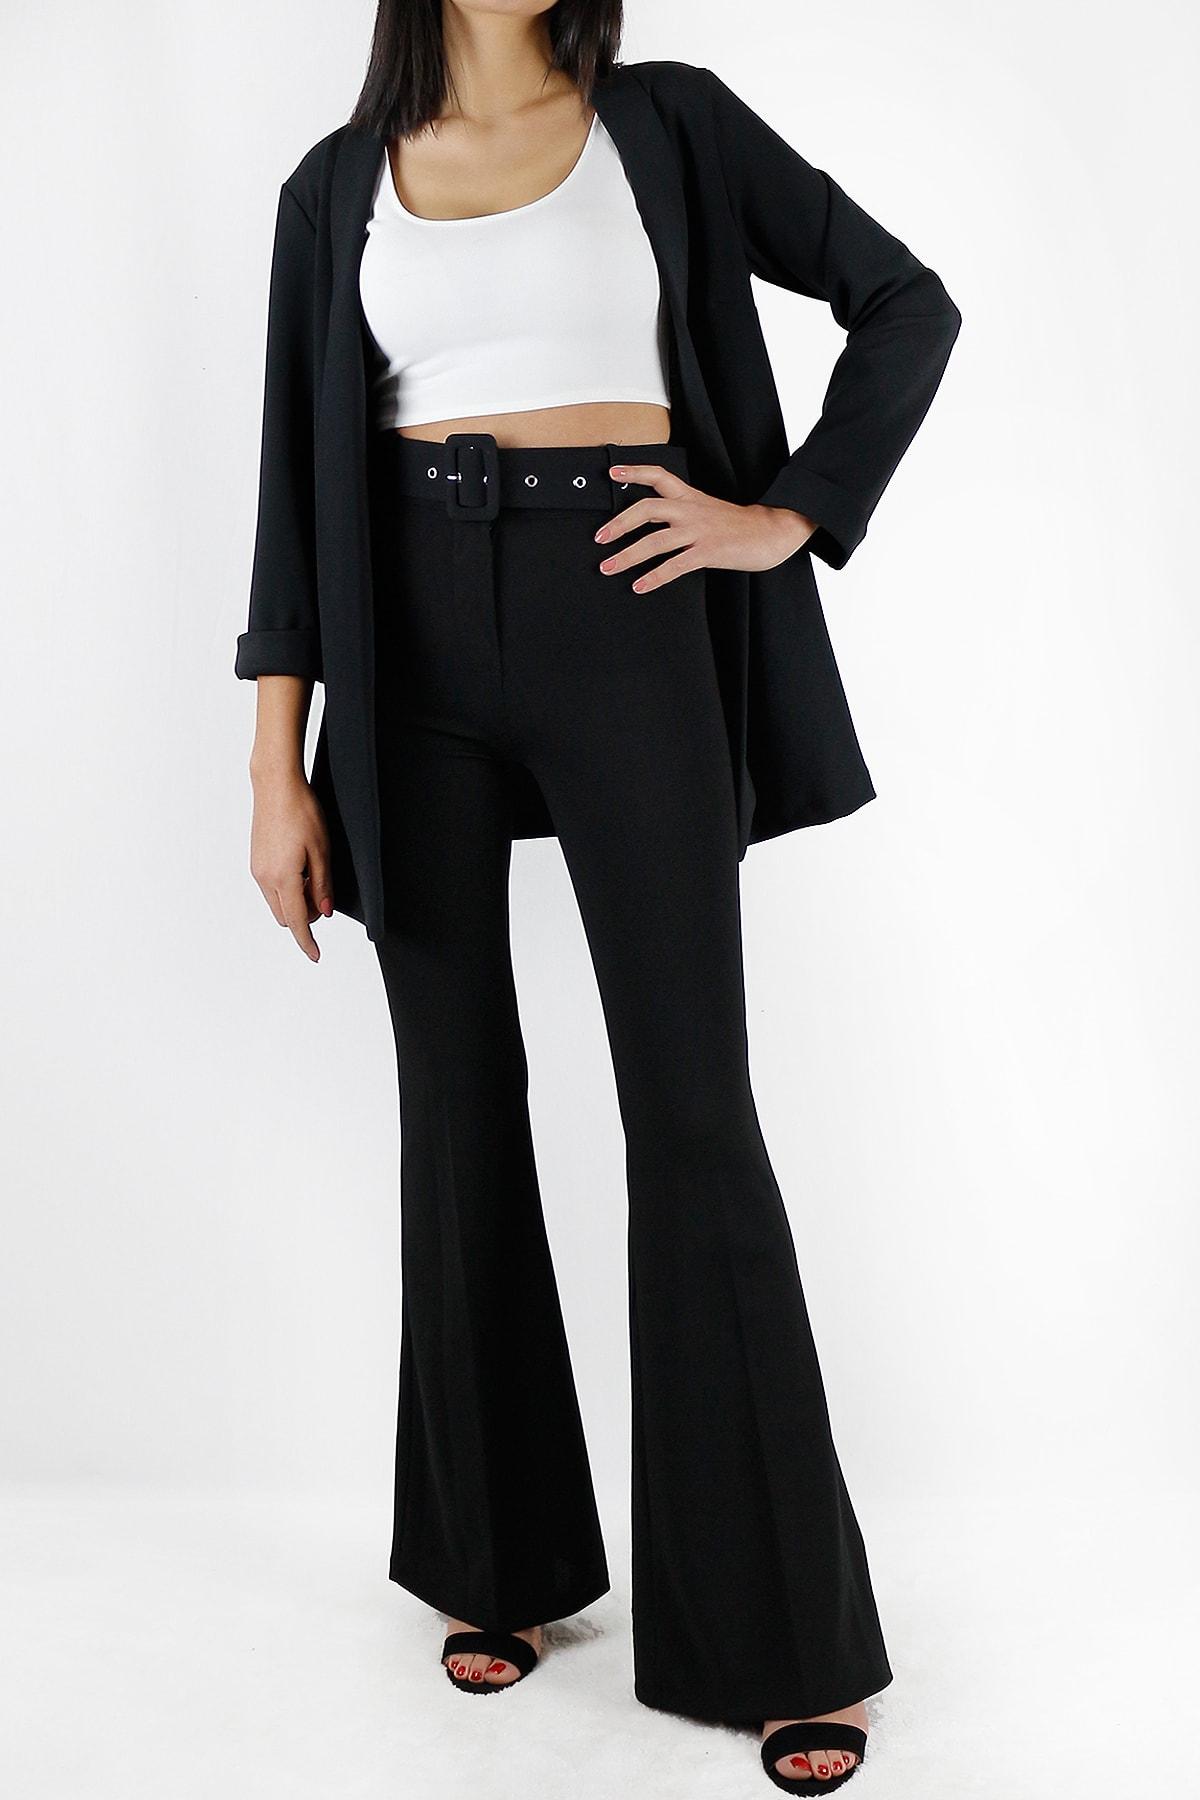 SAR BUTİK 1.kalite Krep Kumaş Yüksek Bel Kemerli Ispanyol Paça Pantolon 1